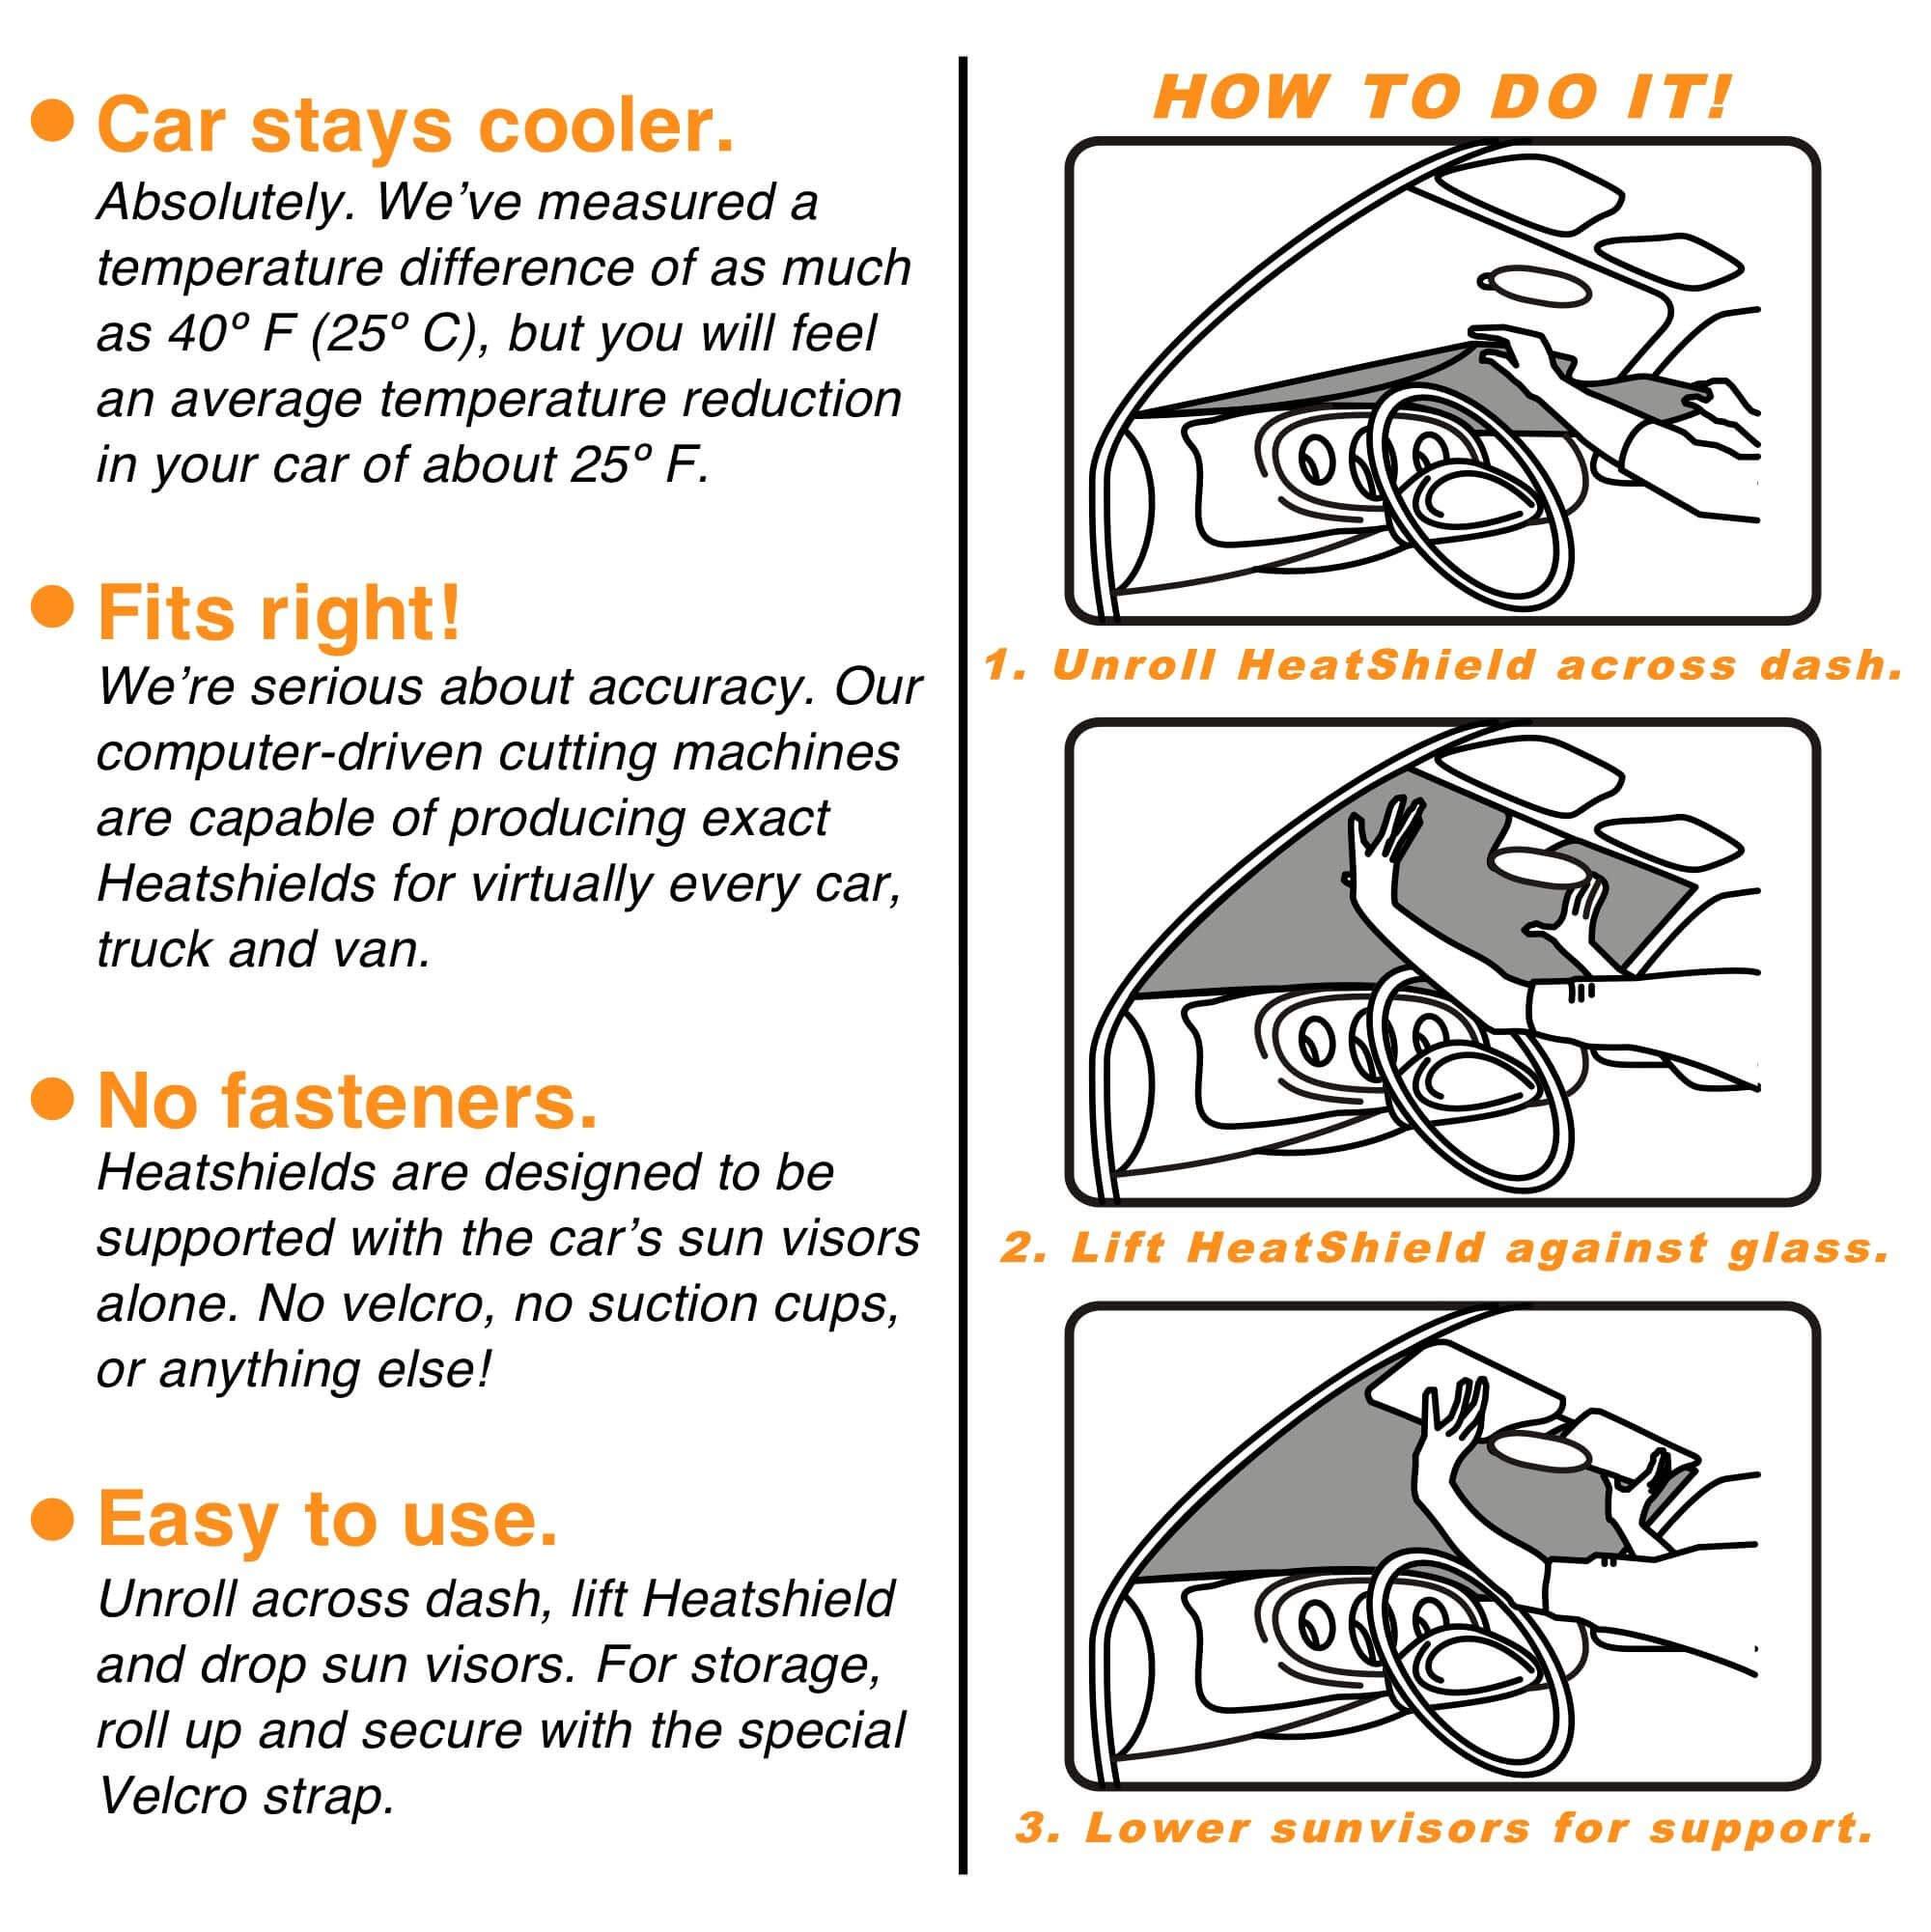 HeatShield The Original Auto Sunshade, Custom-Fit for Honda Civic Sedan 2012, 2013, 2014, 2015, Silver Series by HeatShield (Image #5)